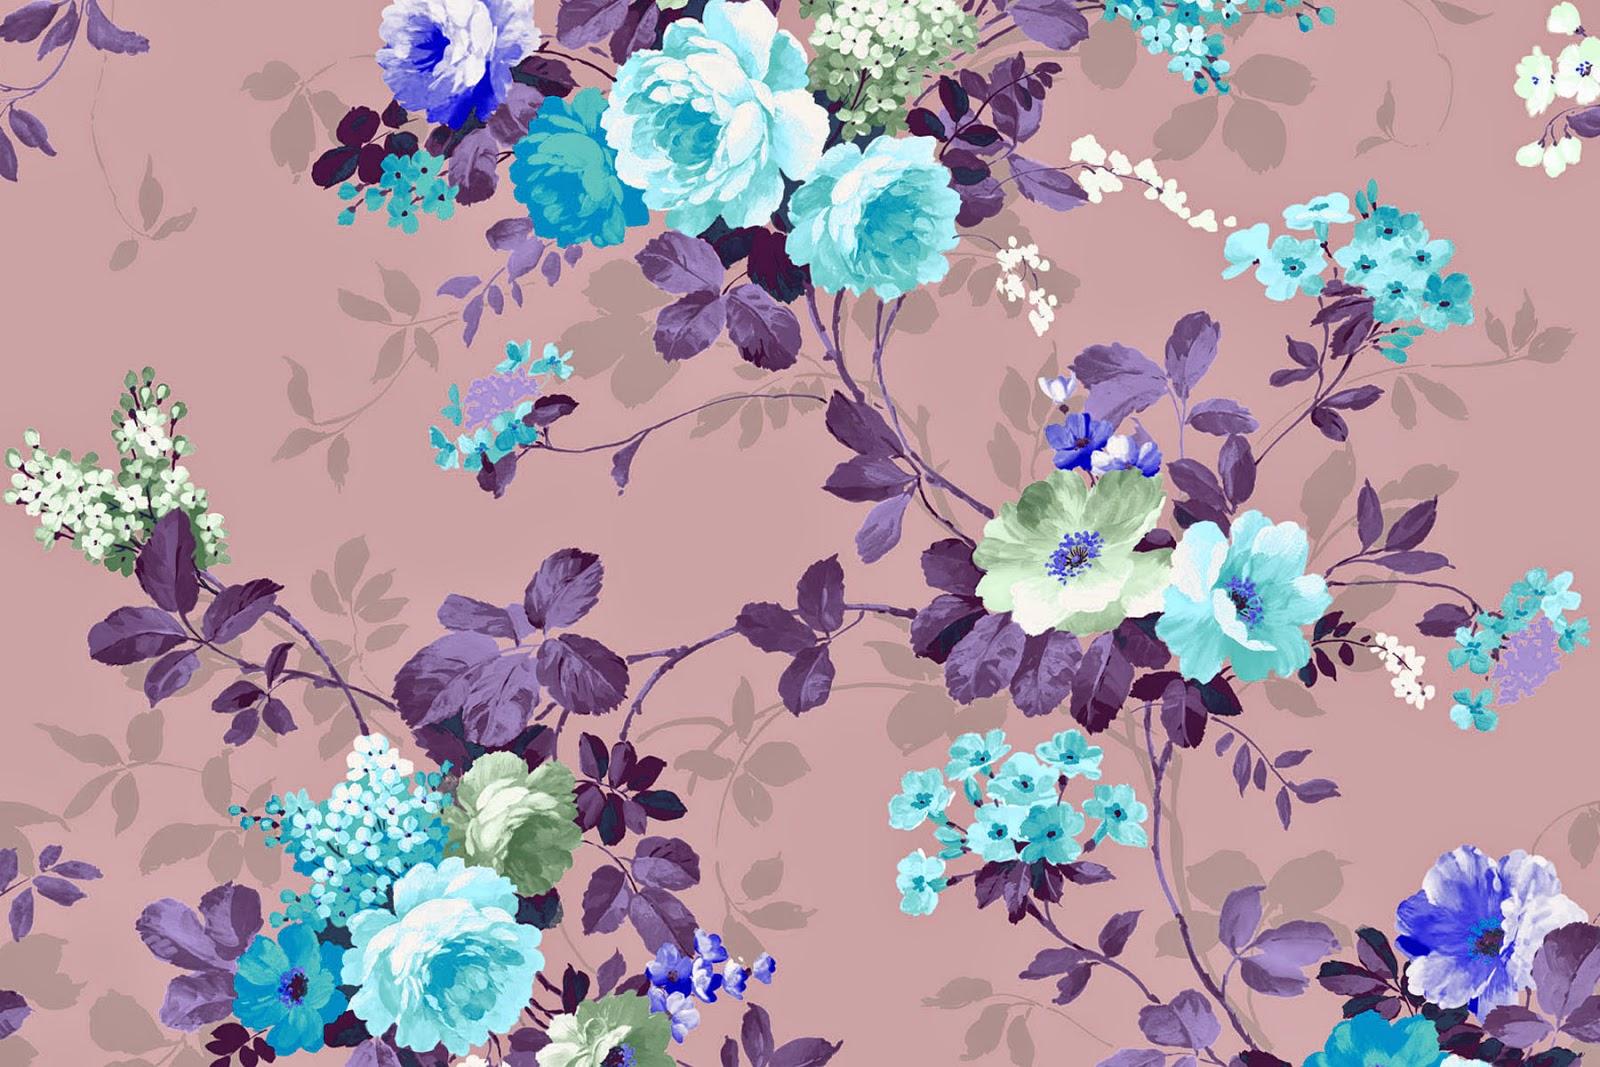 Doodlecraft Vintage Floral Wallpaper Freebies HD Wallpapers Download Free Images Wallpaper [1000image.com]